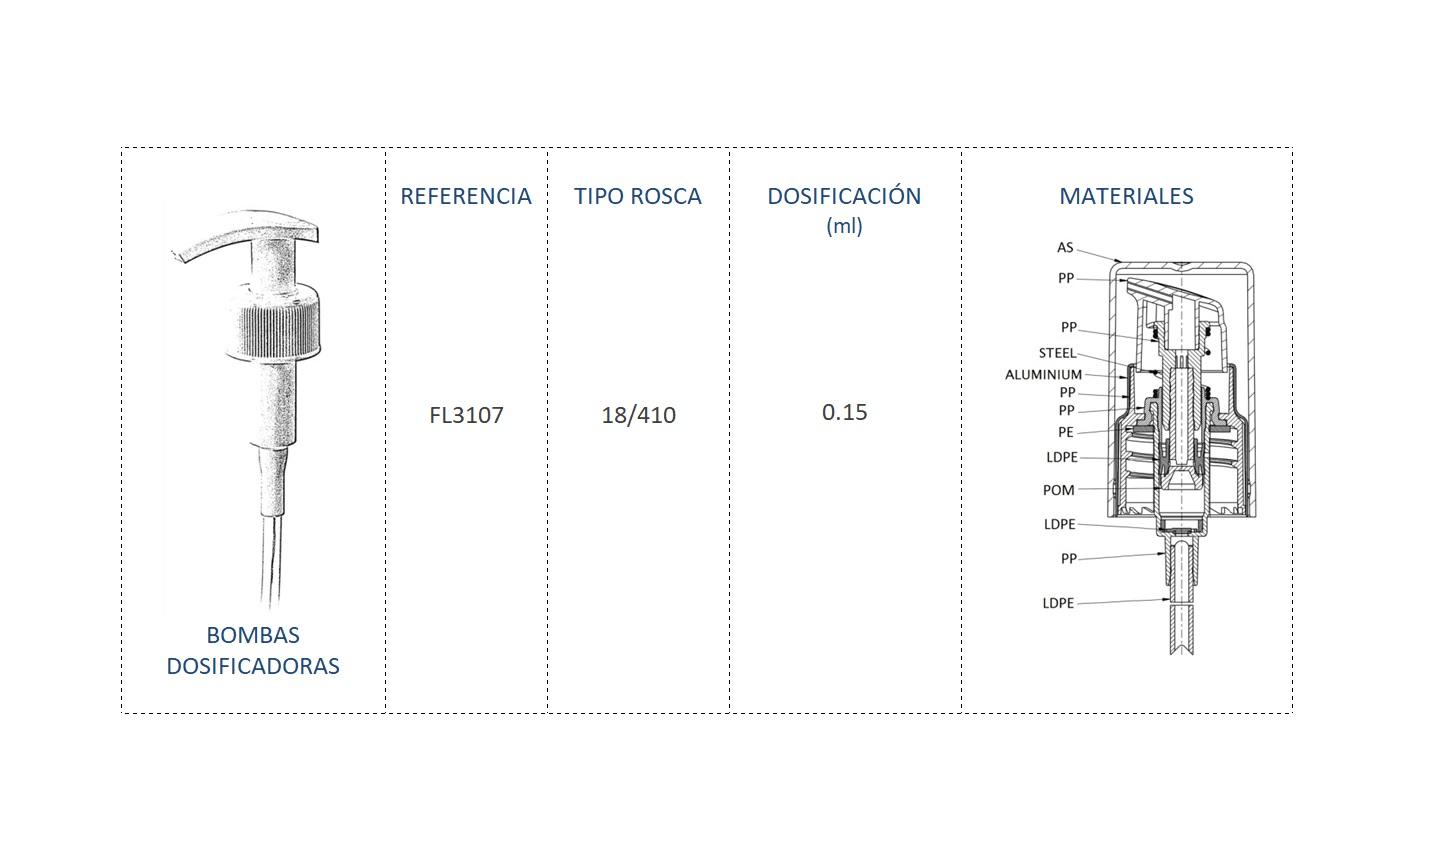 Cuadro de materiales bomba dosificadora FL3107 18/410